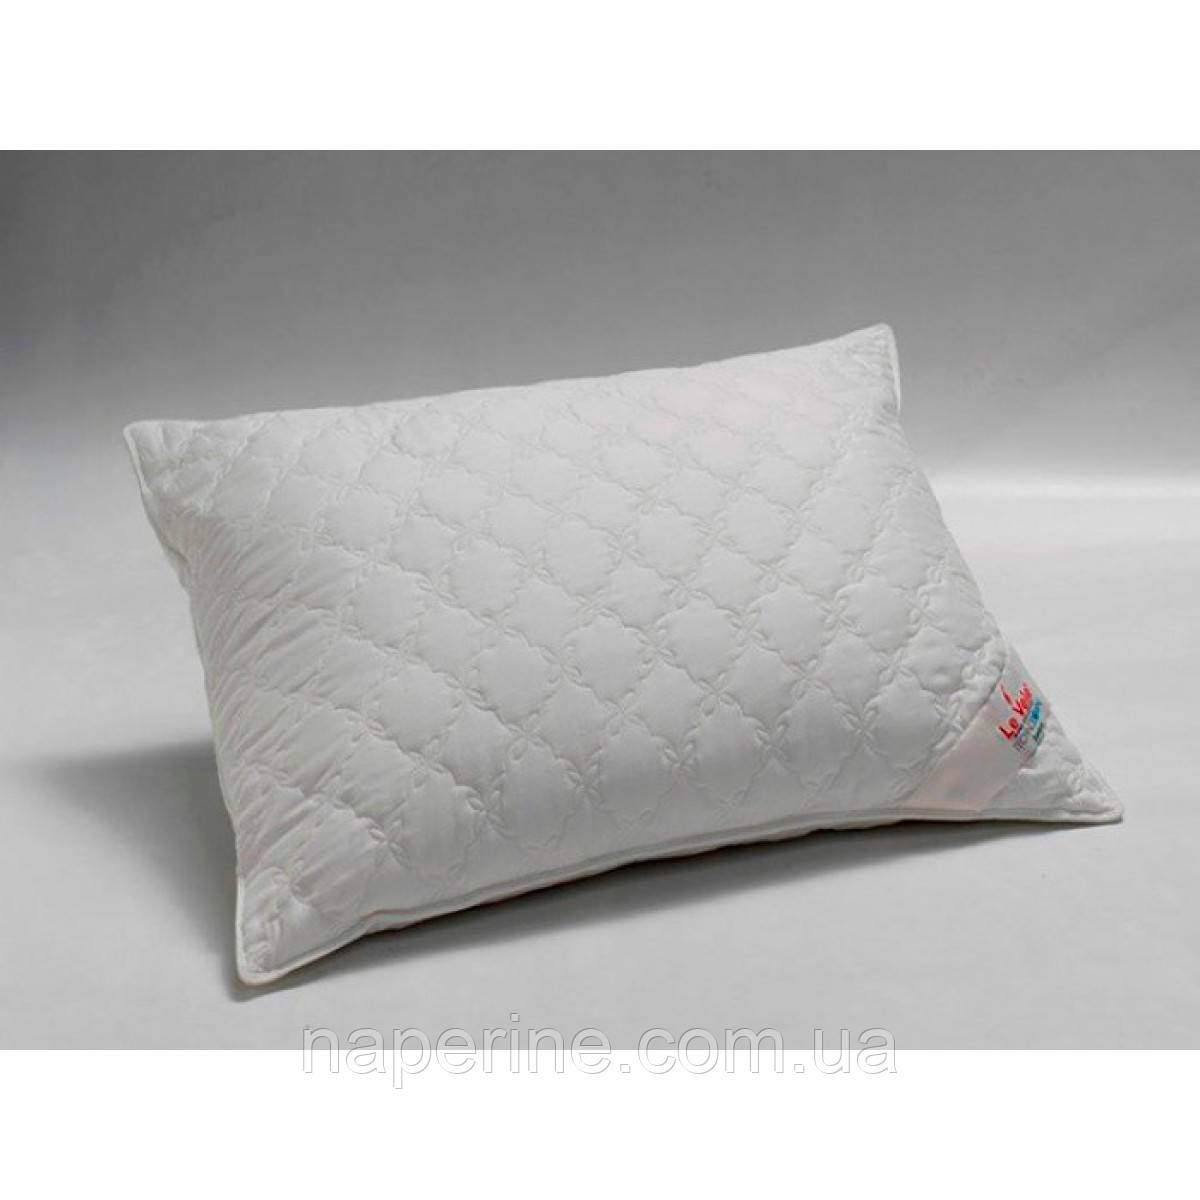 "Подушка стёганная 50*70  Le Vele  ""Figure Bamboo Pillow"""